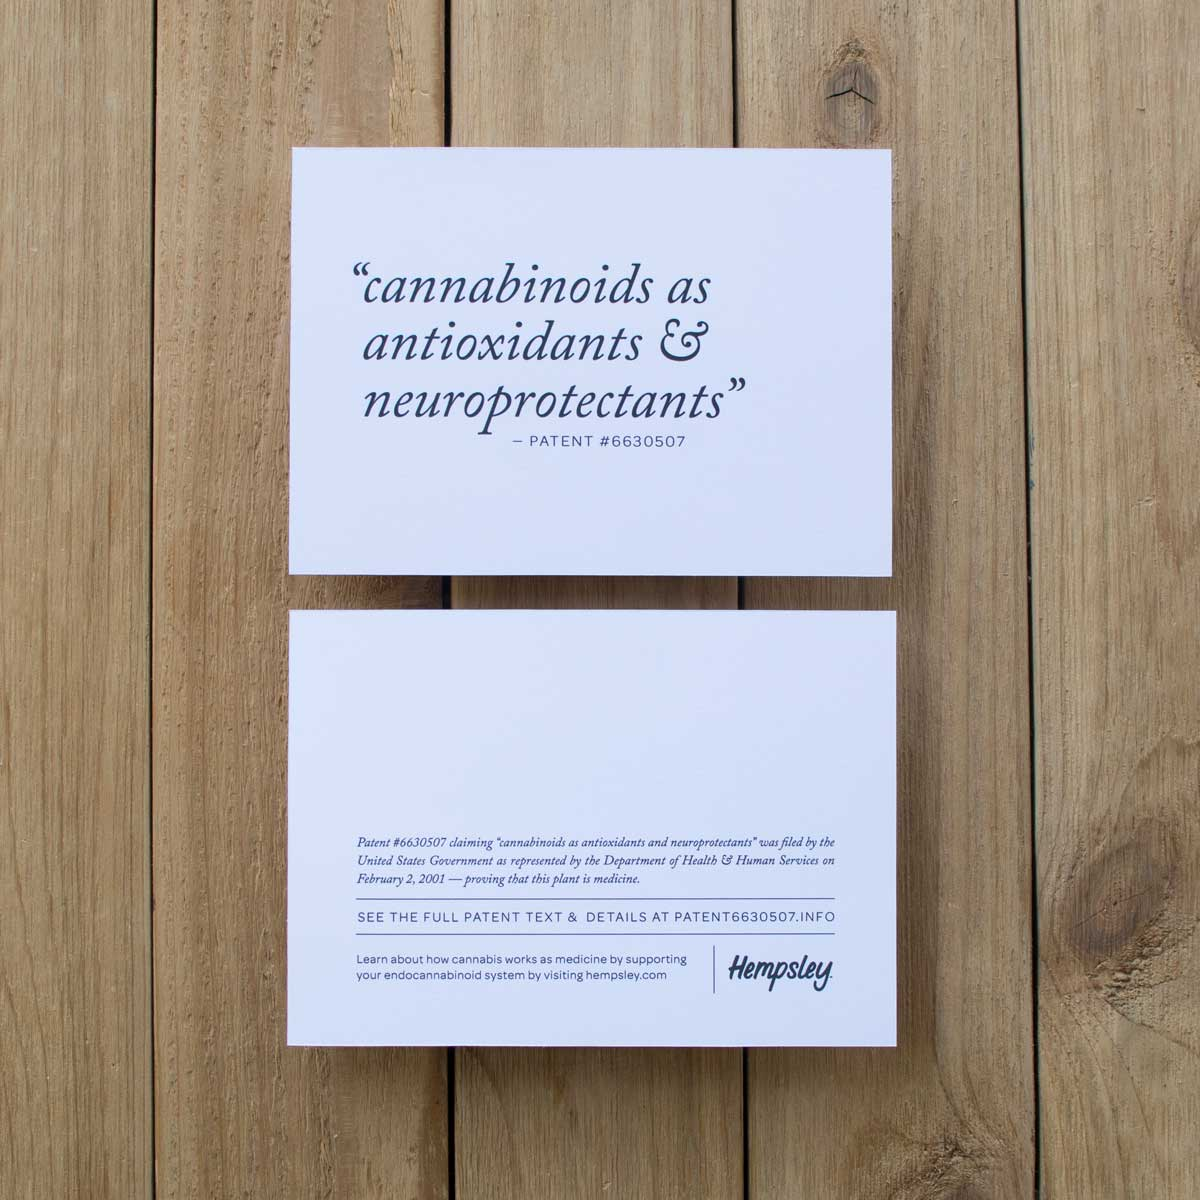 government-cannabis-patent-6630507-artwork-hempsley